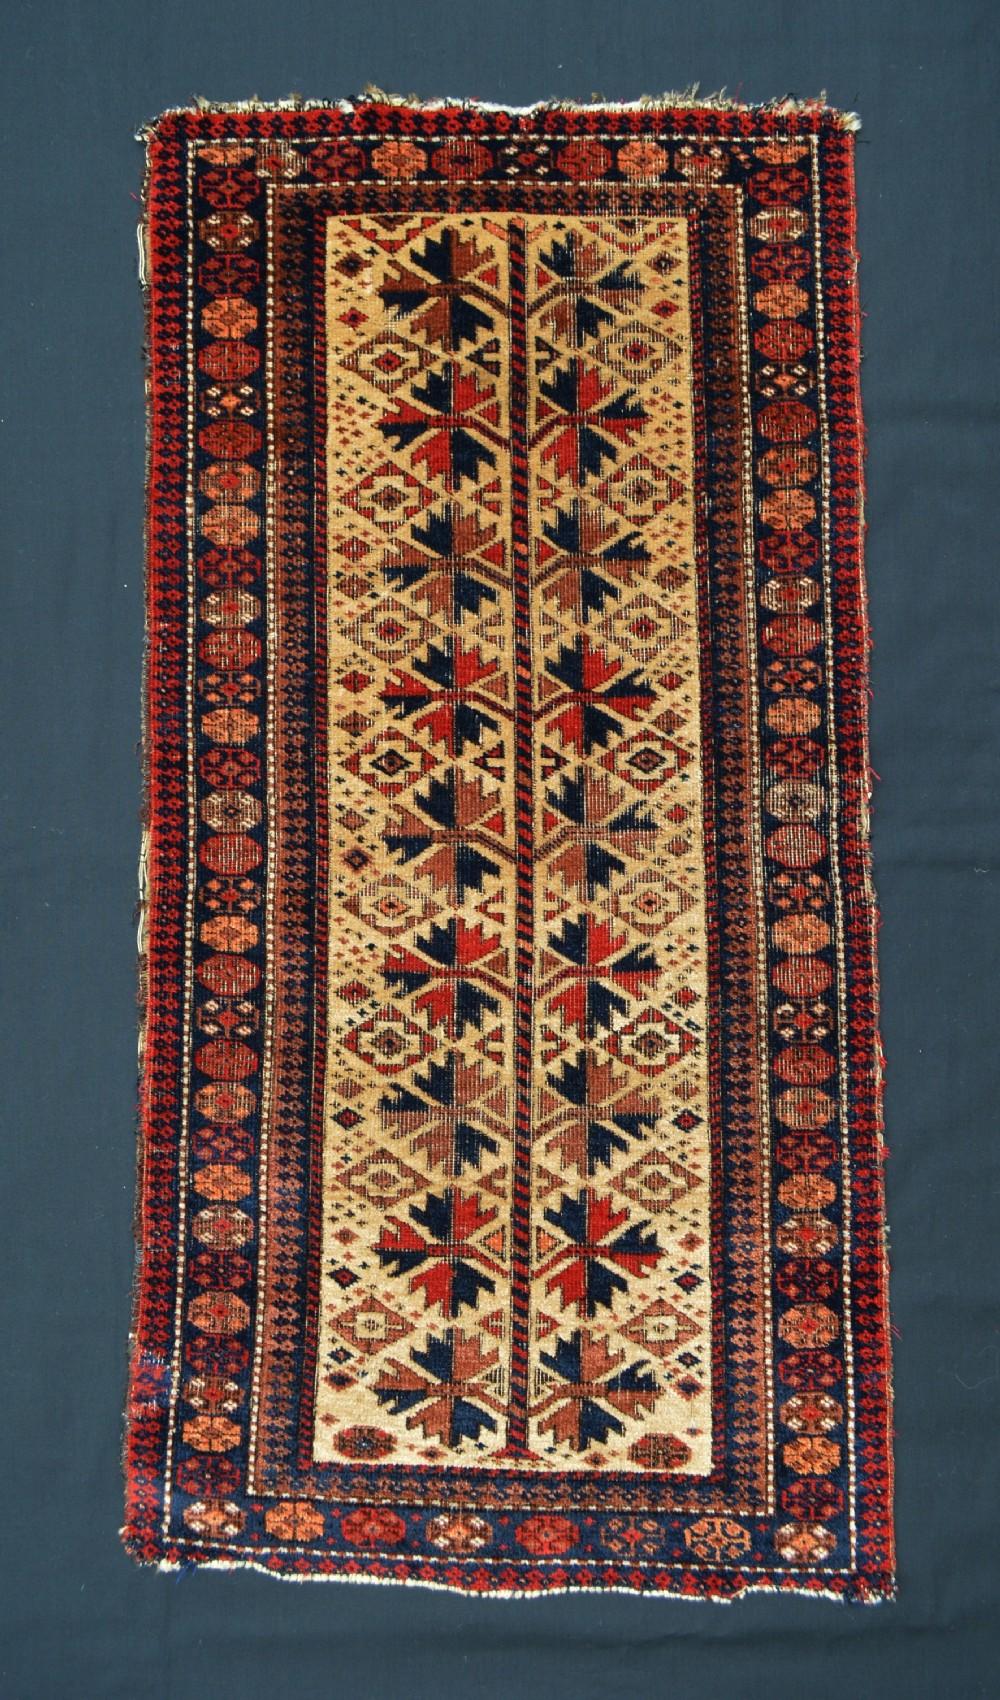 antique balisht pillow bagface timuri yaqoubkhani tribe borderlands of east persiawest afghanistan